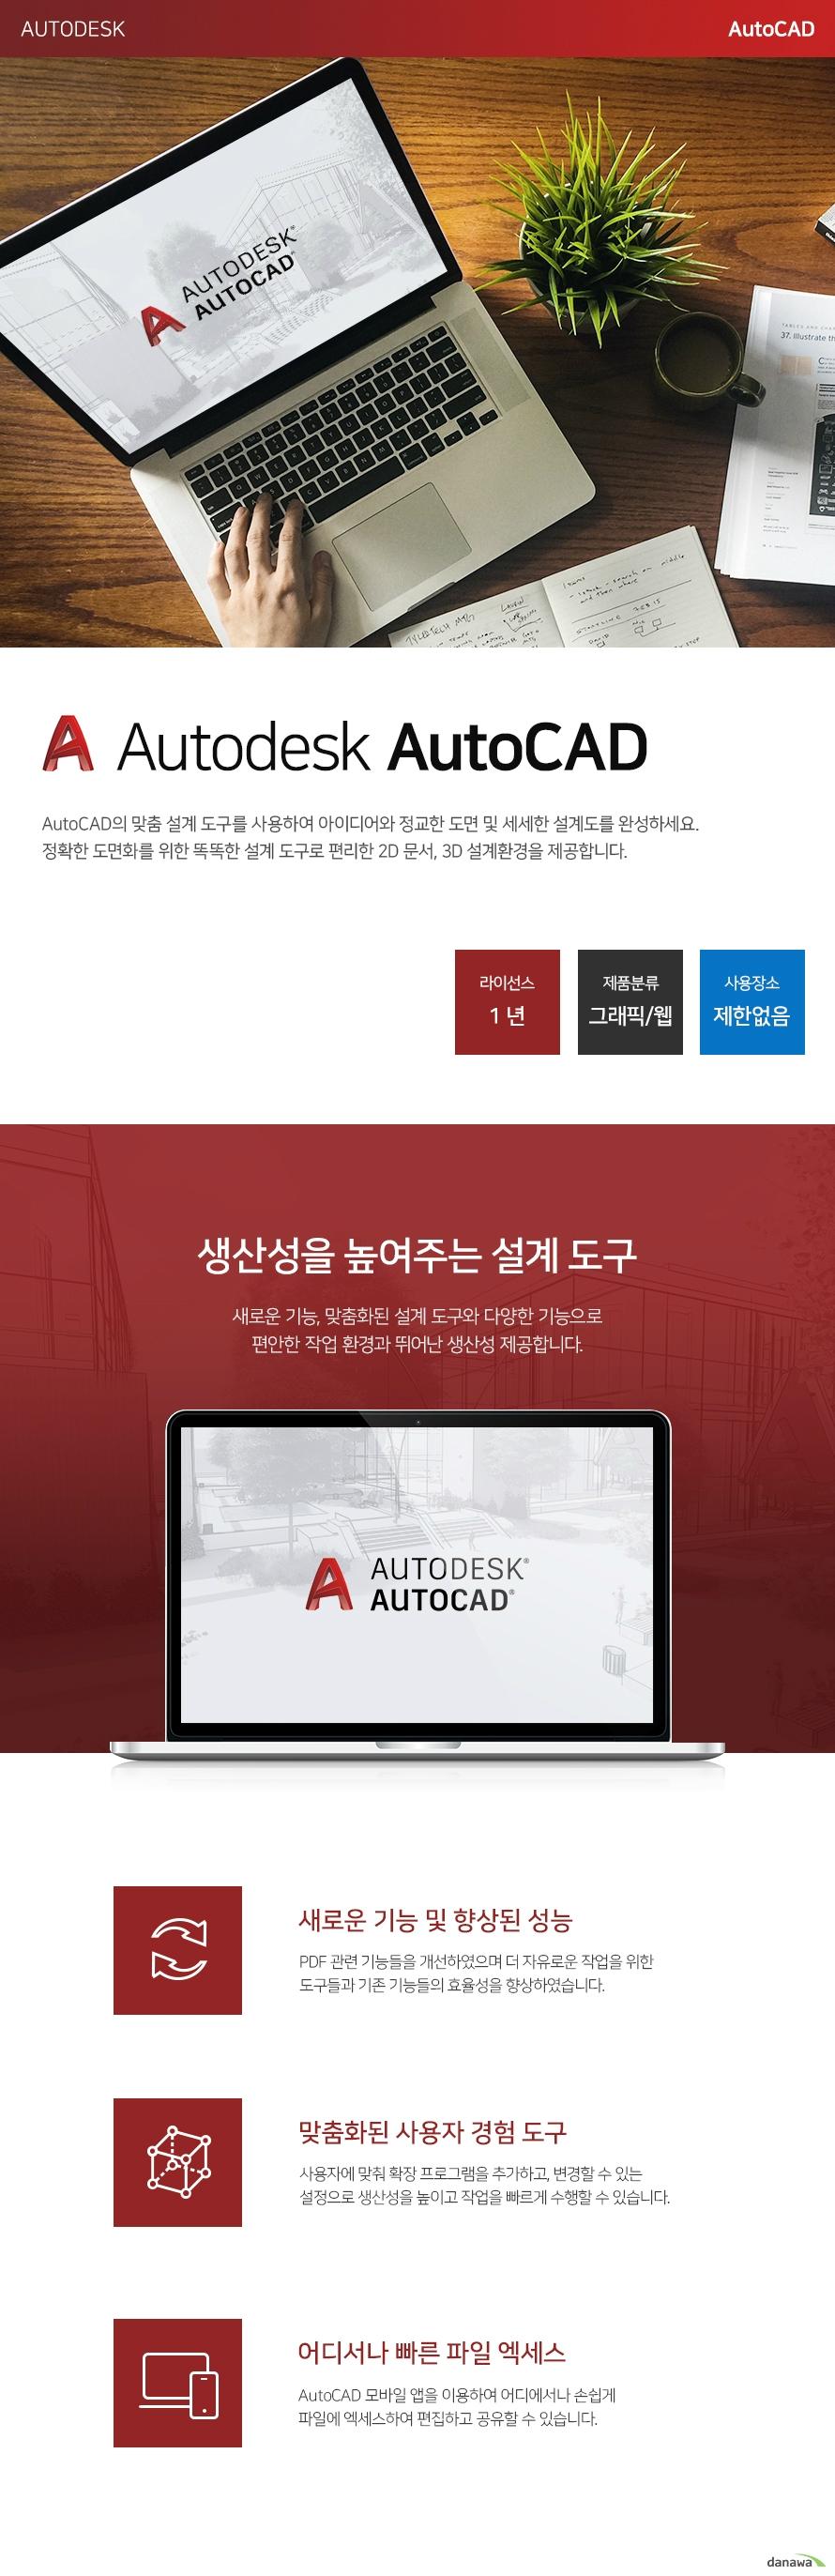 Autodesk AutoCAD AutoCAD의 맞춤 설계 도구를 사용하여 아이디어와 정교한 도면 및 세세한 설계도를 완성하세요. 정확한 도면화를 위한 똑똑한 설계 도구로 편리한 2D 문서, 3D 설계환경을 제공합니다. 생산성을 높여주는 설계 도구 새로운 기능, 맞춤화된 설계 도구와 다양한 기능으로 편안한 작업 환경과 뛰어난 생산성 제공합니다. 새로운 기능 및 향상된 성능 PDF 관련 기능들을 개선하였으며 더 자유로운 작업을 위한 도구들과 기존 기능들의 효율성을 향상하였습니다. 맞춤화된 사용자 경험 도구 사용자에 맞춰 확장 프로그램을 추가하고, 변경할 수 있는 설정으로 생산성을 높이고 작업을 빠르게 수행할 수 있습니다. 어디서나 빠른 파일 엑세스 AutoCAD 모바일 앱을 이용하여 어디에서나 손쉽게  파일에 엑세스하여 편집하고 공유할 수 있습니다. 신속하고 정교한 설계 Autodesk AutoCAD